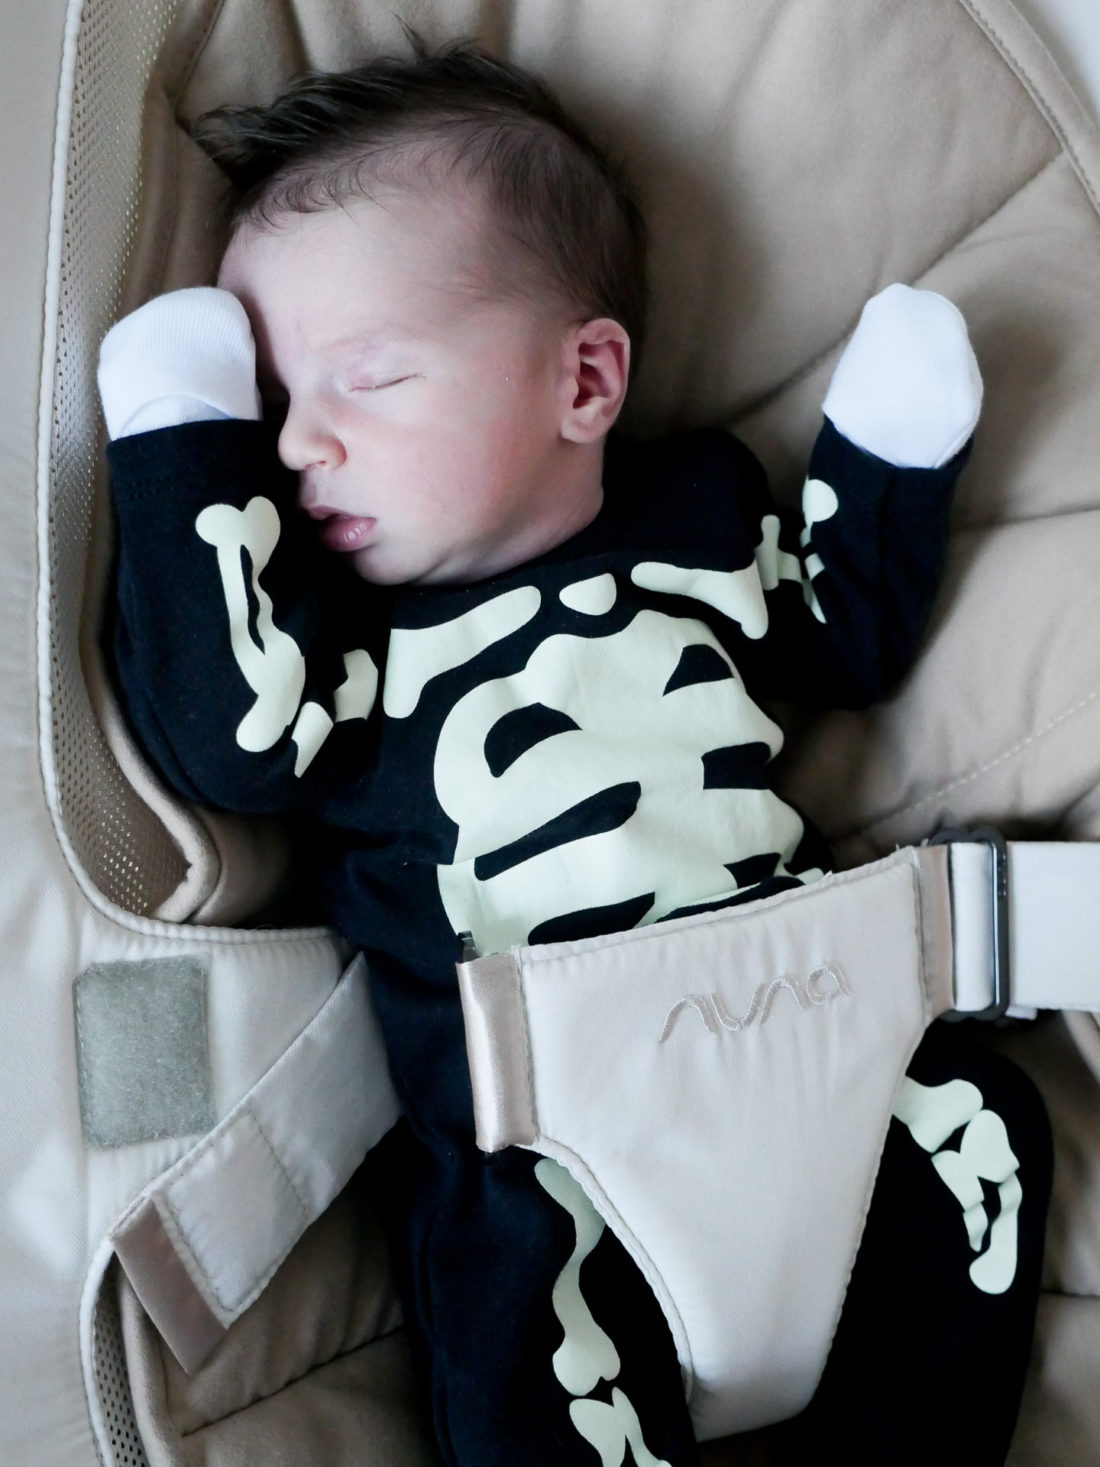 Major Martino, wearing a skeleton Halloween costume at one week old